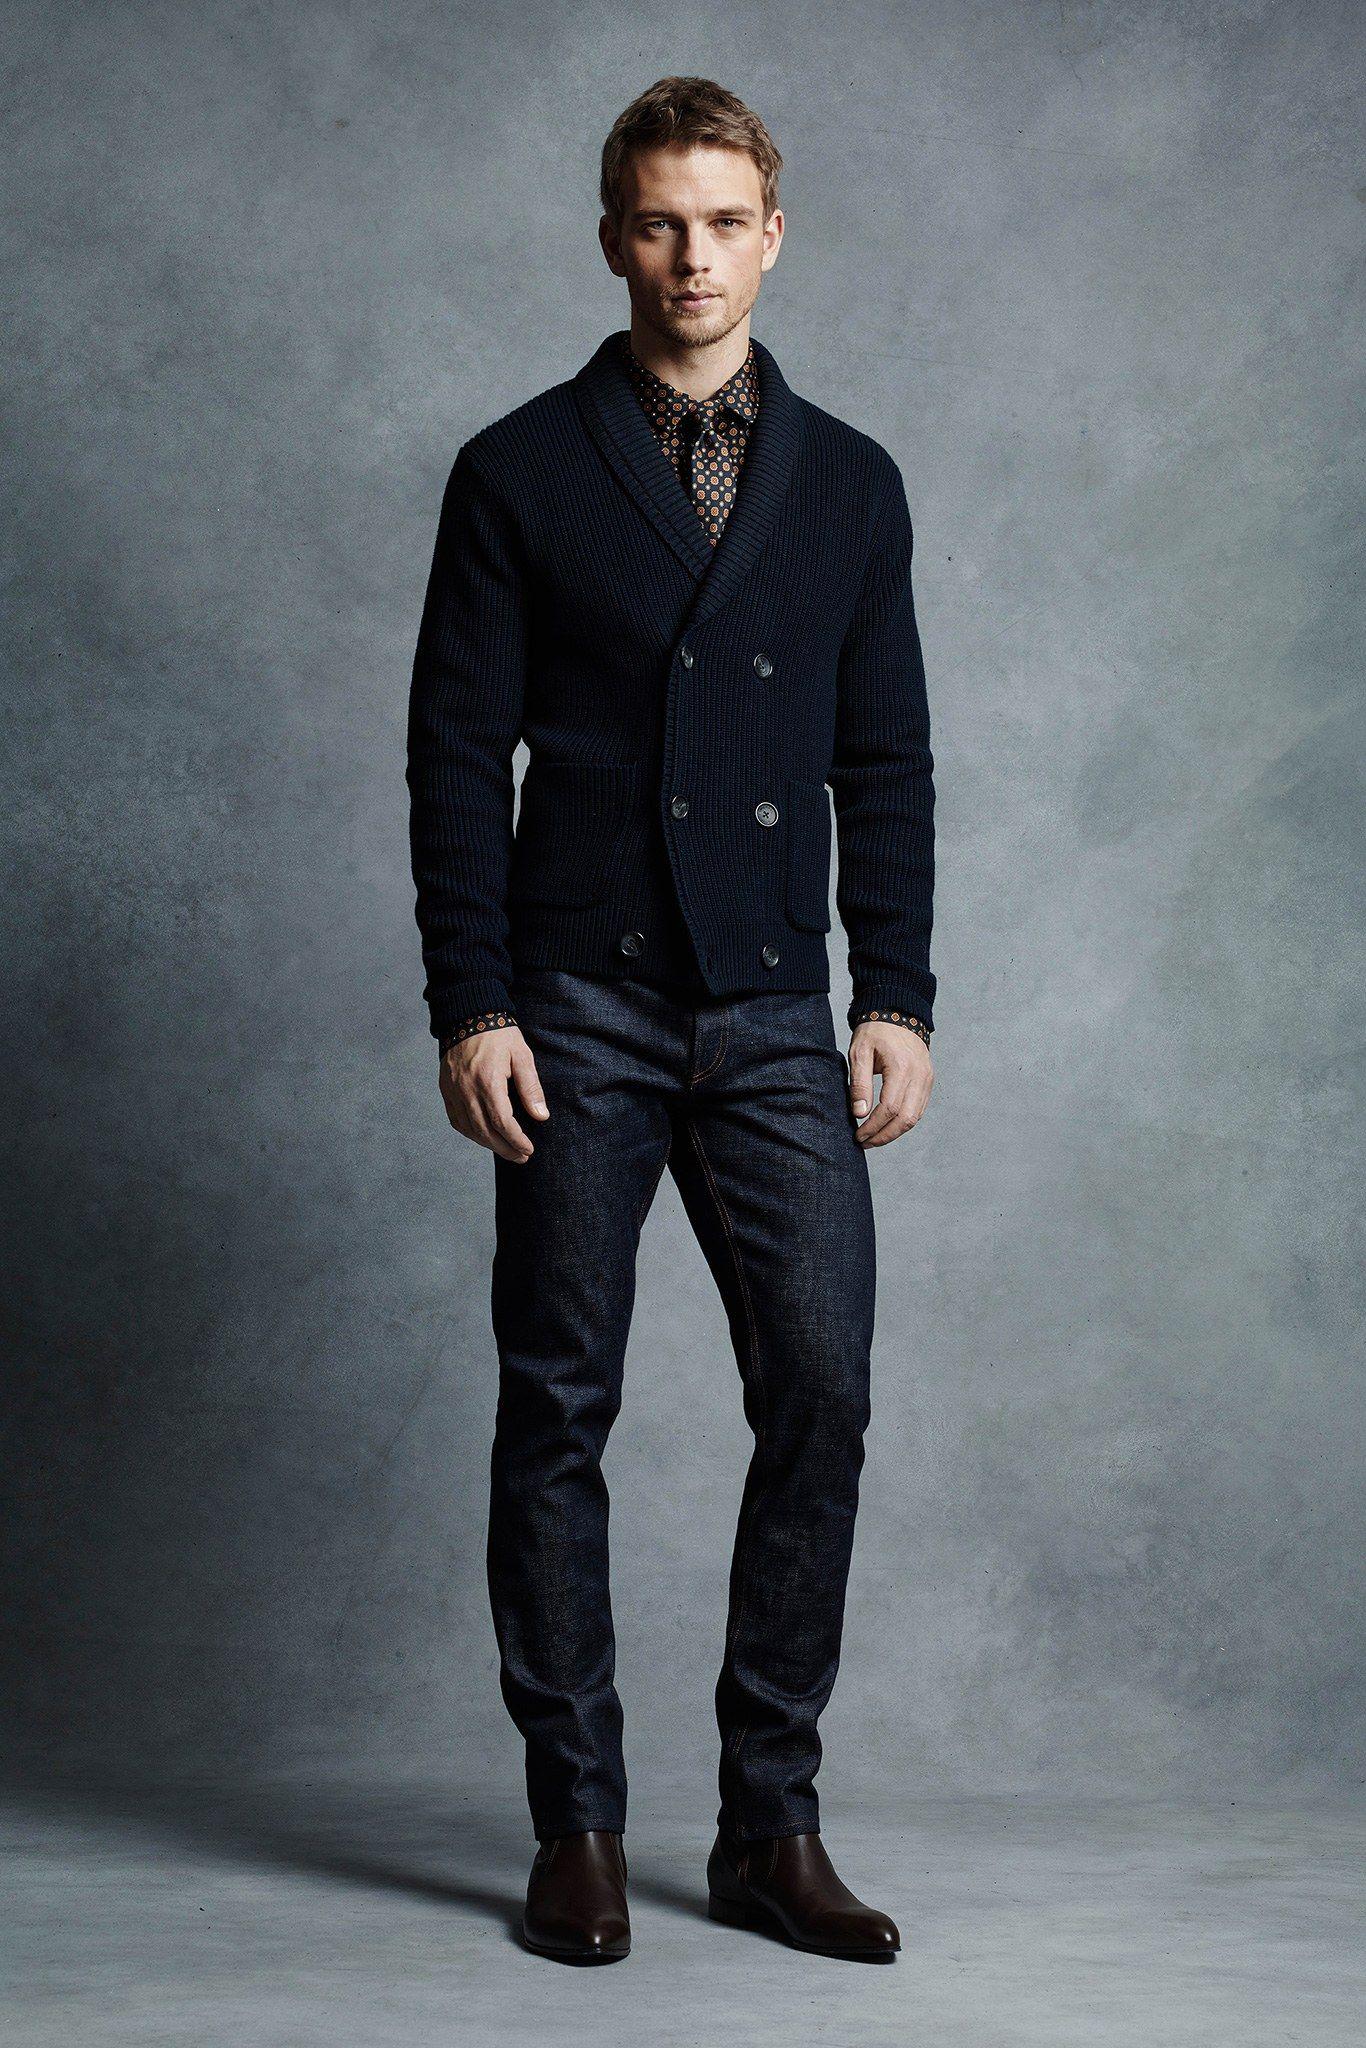 Michael Kors Collection Fall 2015 Menswear Collection Photos - Vogue